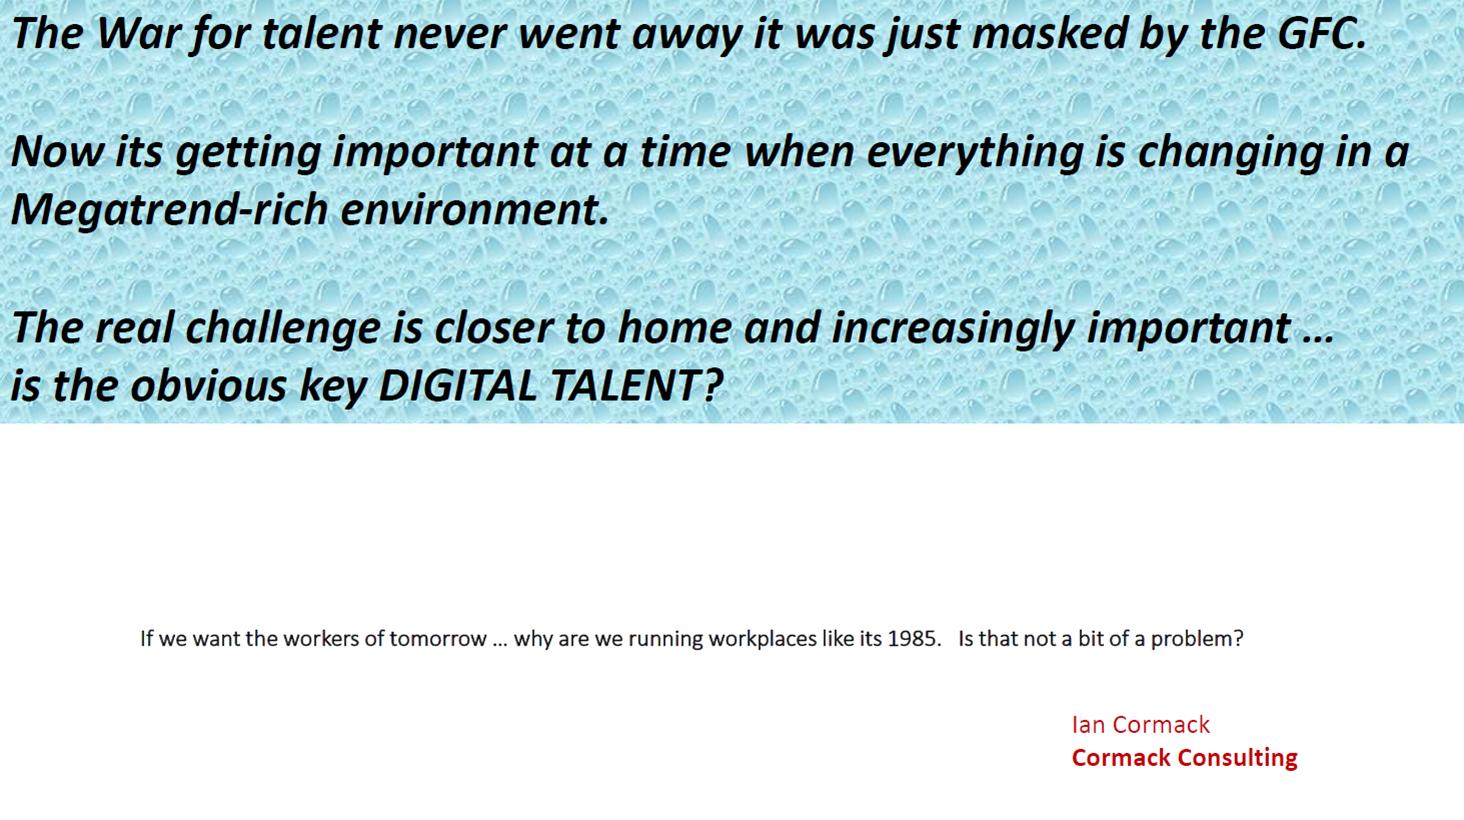 Strategic Talent Sourcing for Tomorrow's Digital Workforce